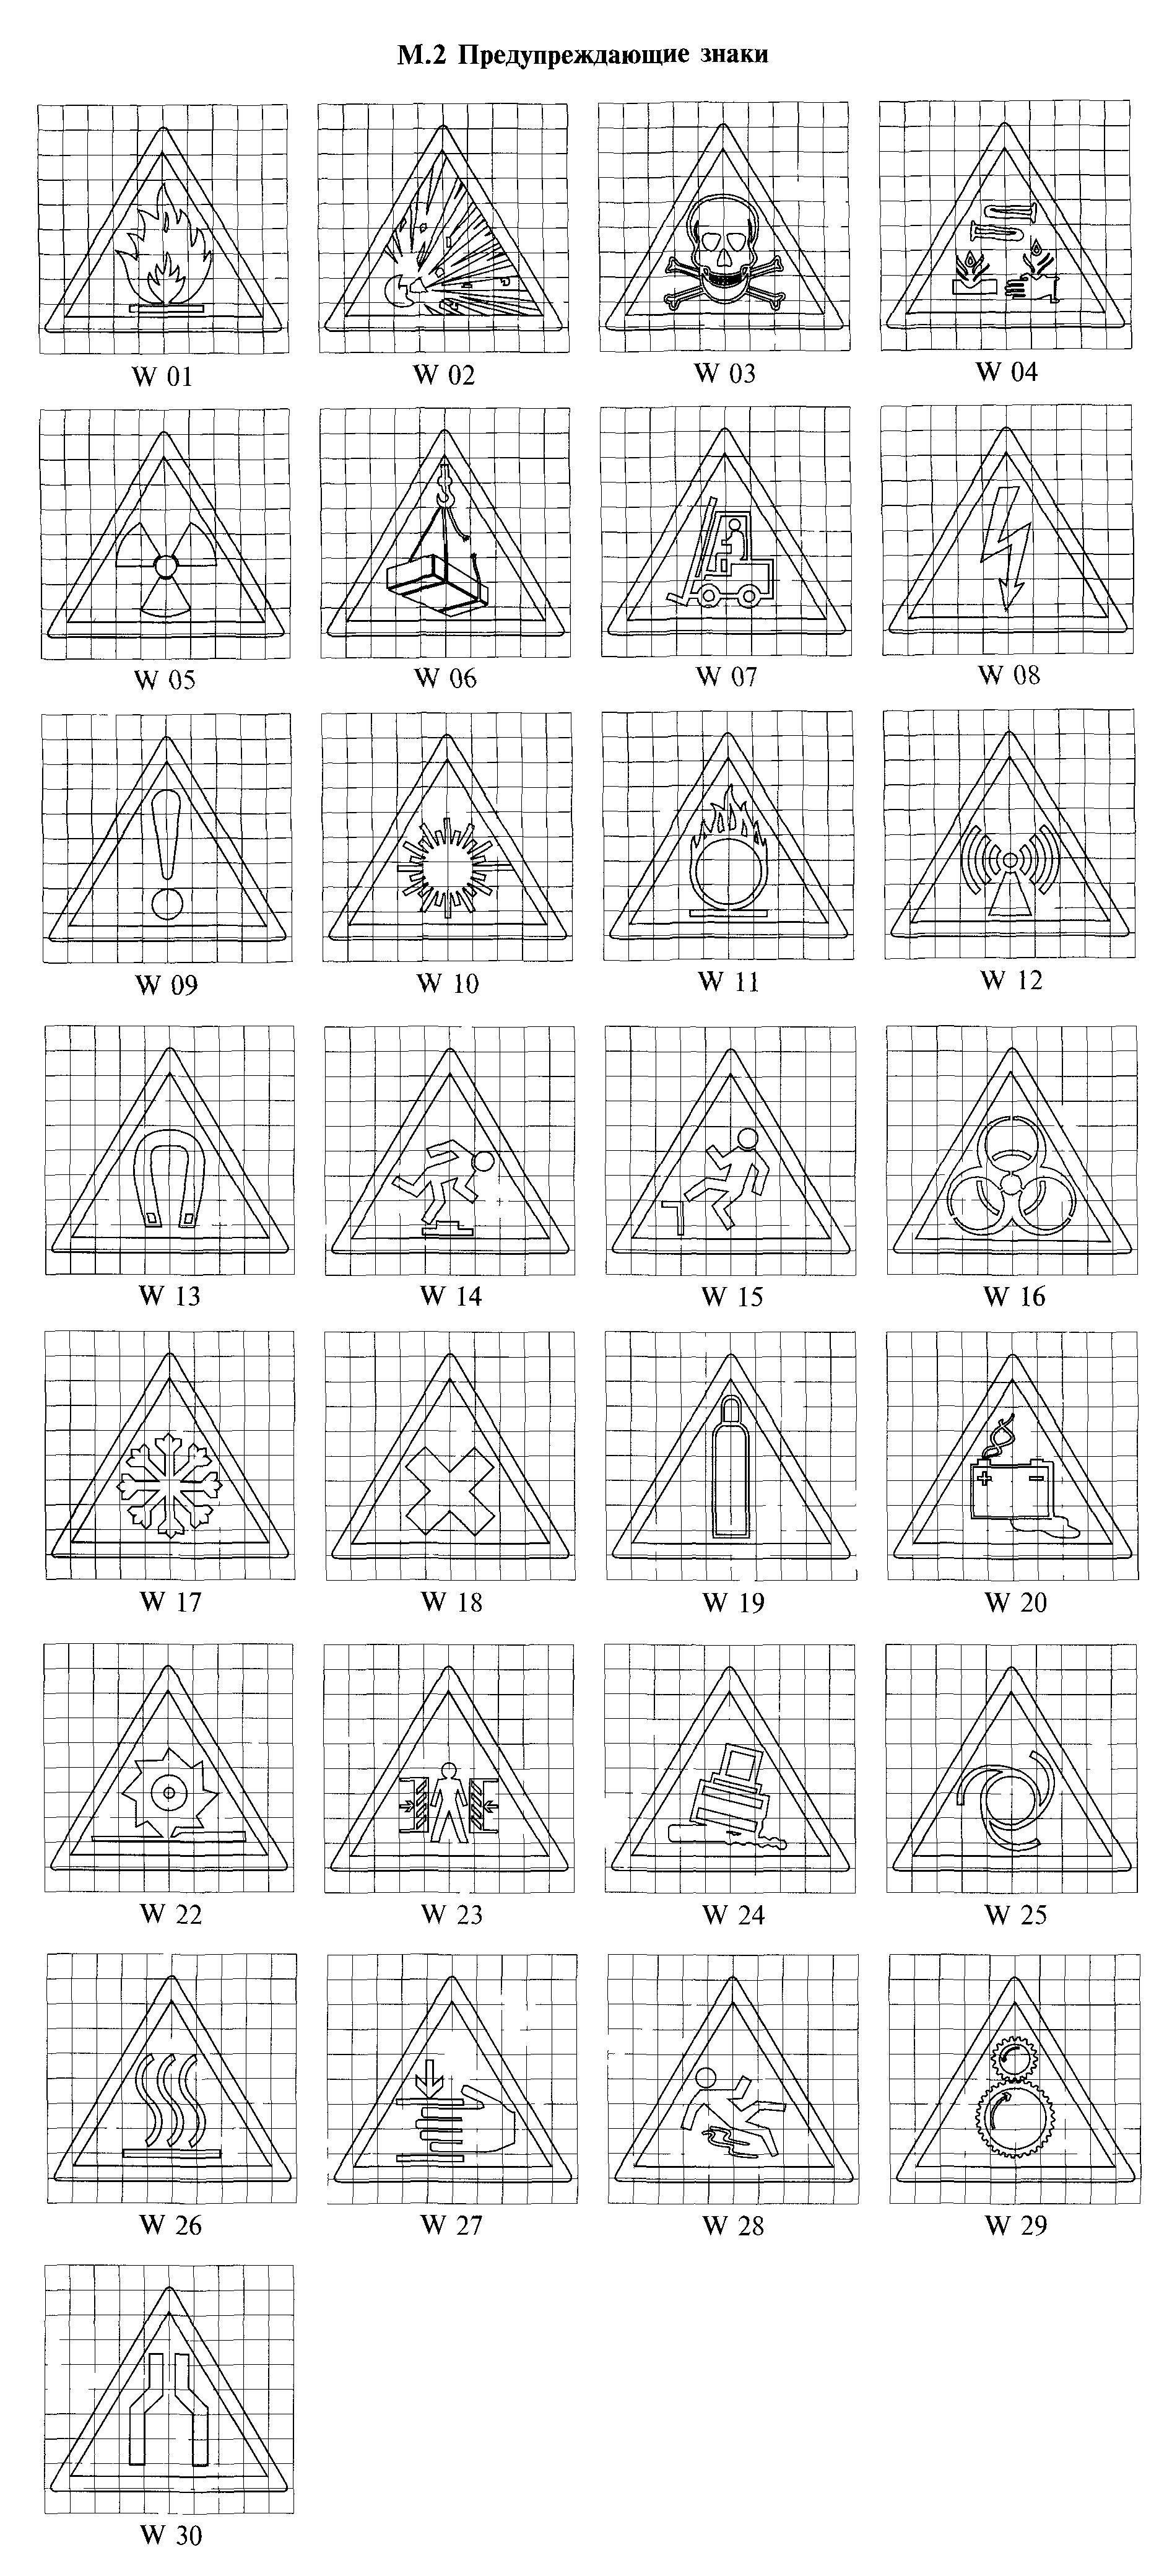 РИСУНОК М.2. К ГОСТ Р 12.4.026-2001